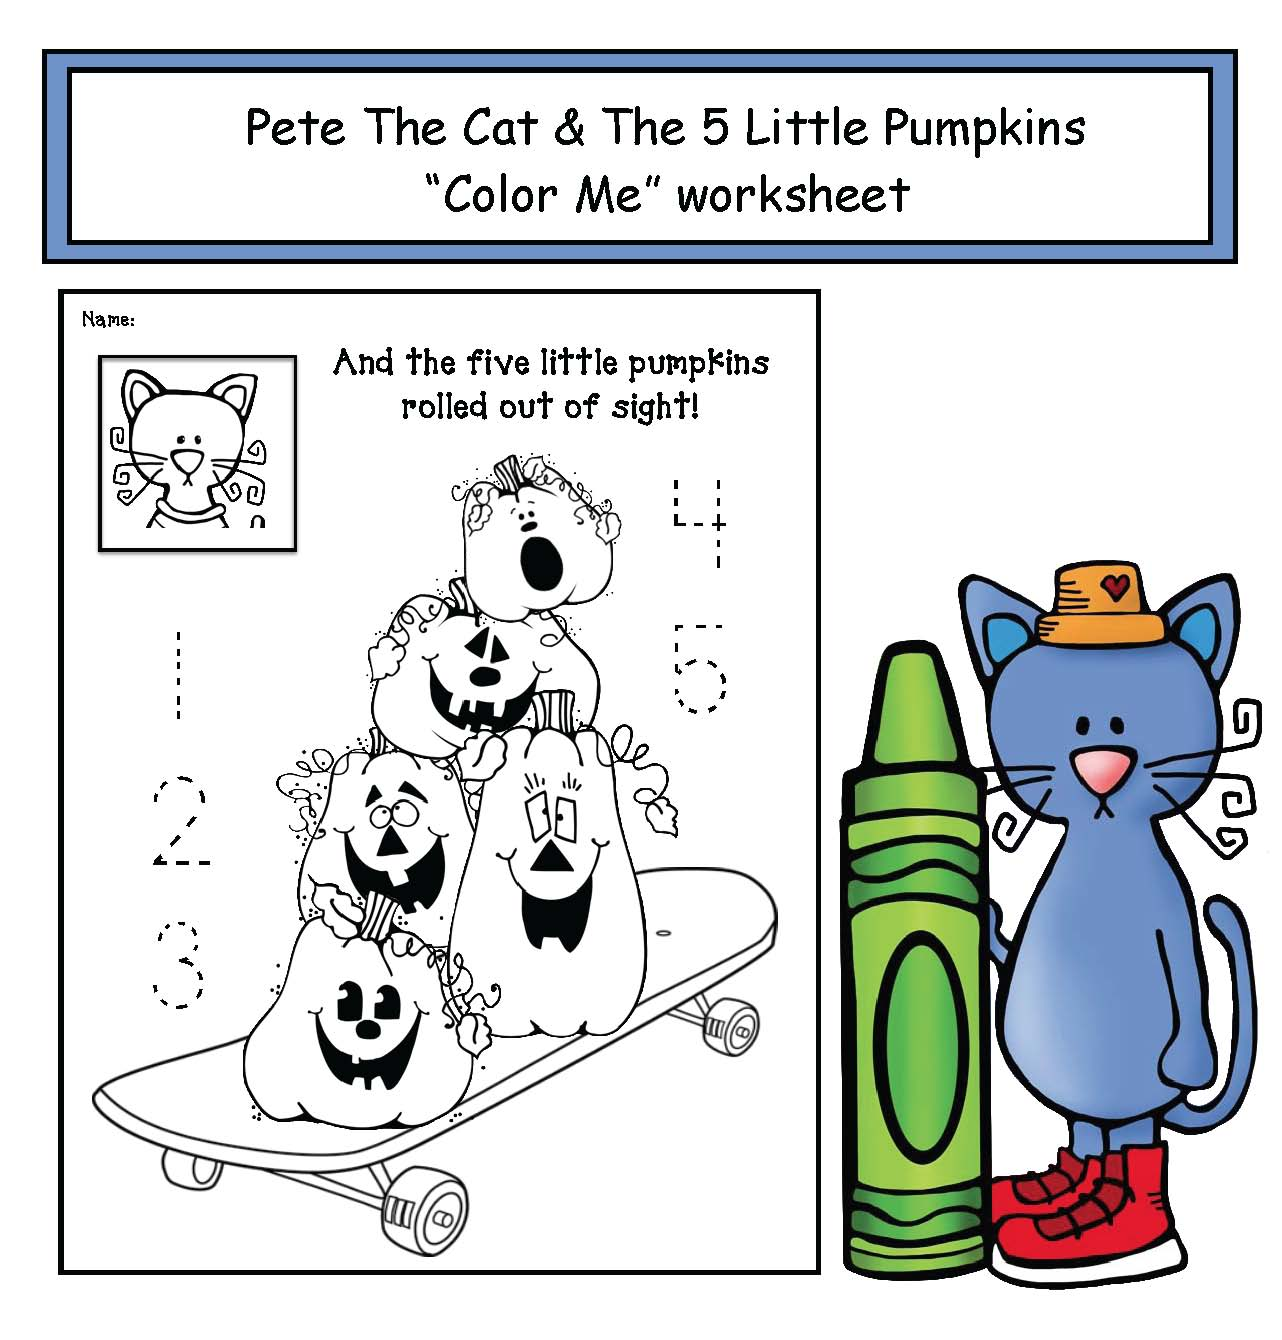 worksheet Pete The Cat Worksheets classroom freebies pete the cat and 5 little pumpkins pumpkins